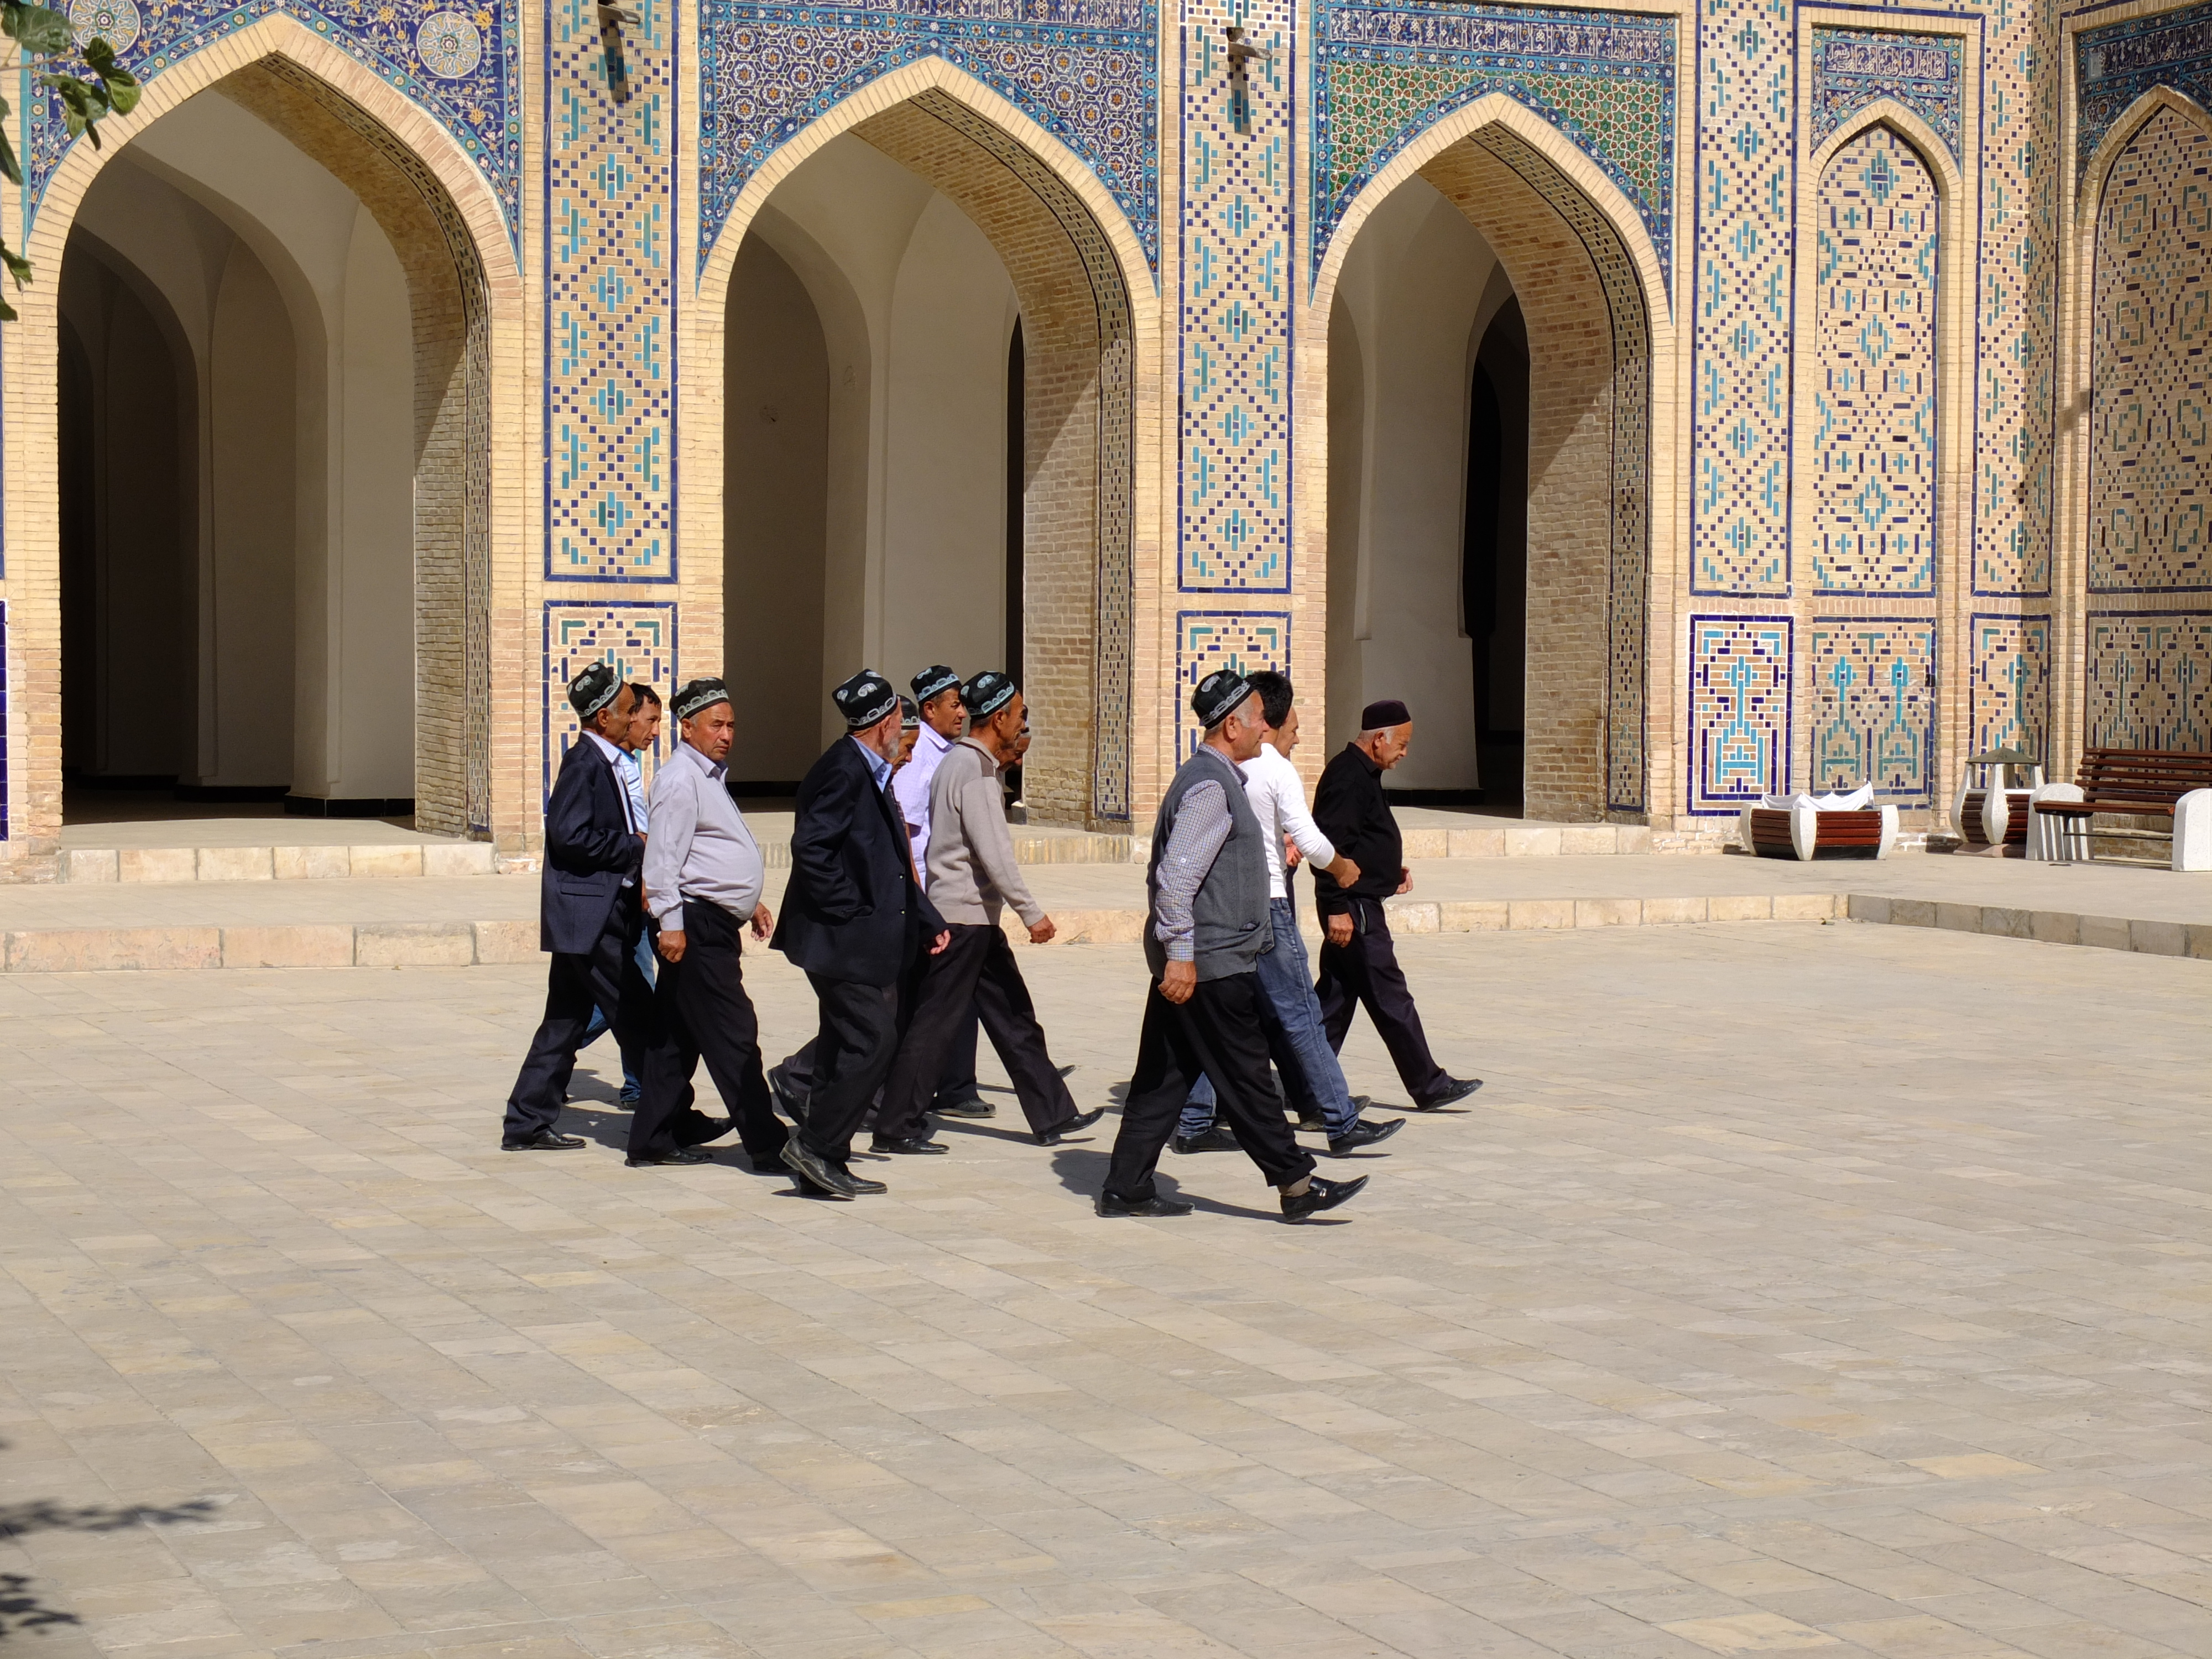 visiter l'Ouzbékistan